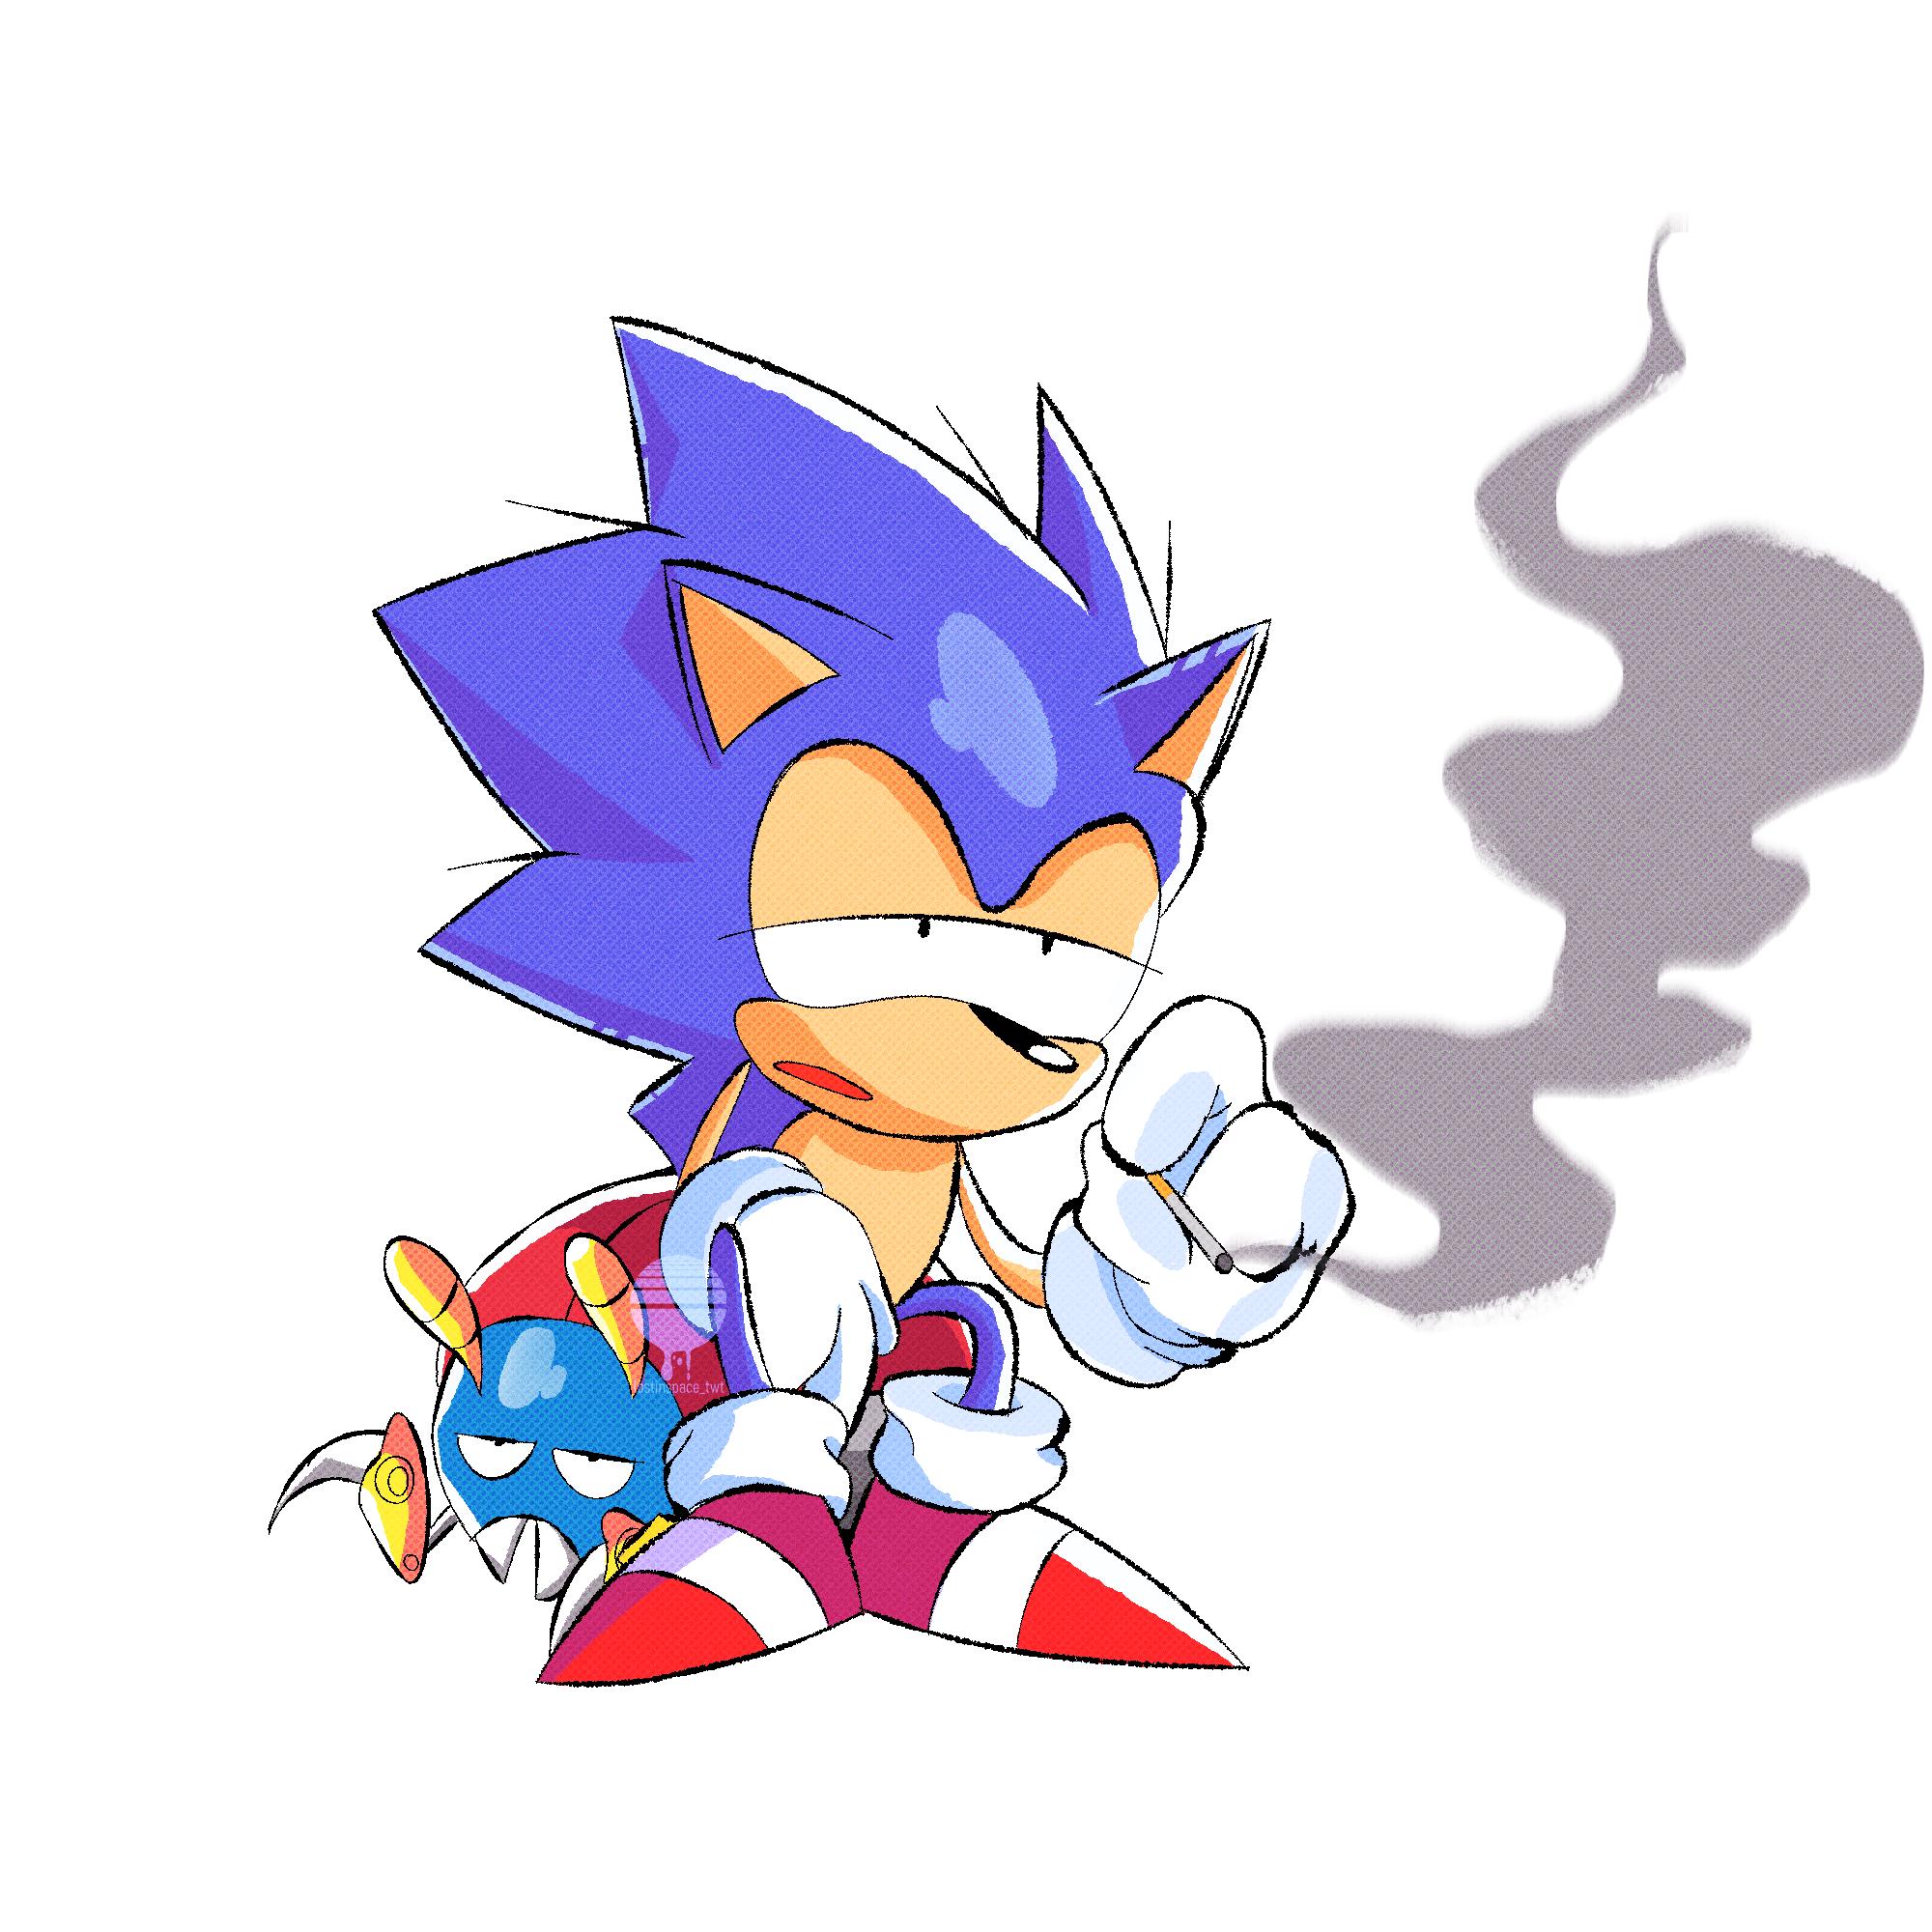 Sonic smoking a cig lmao